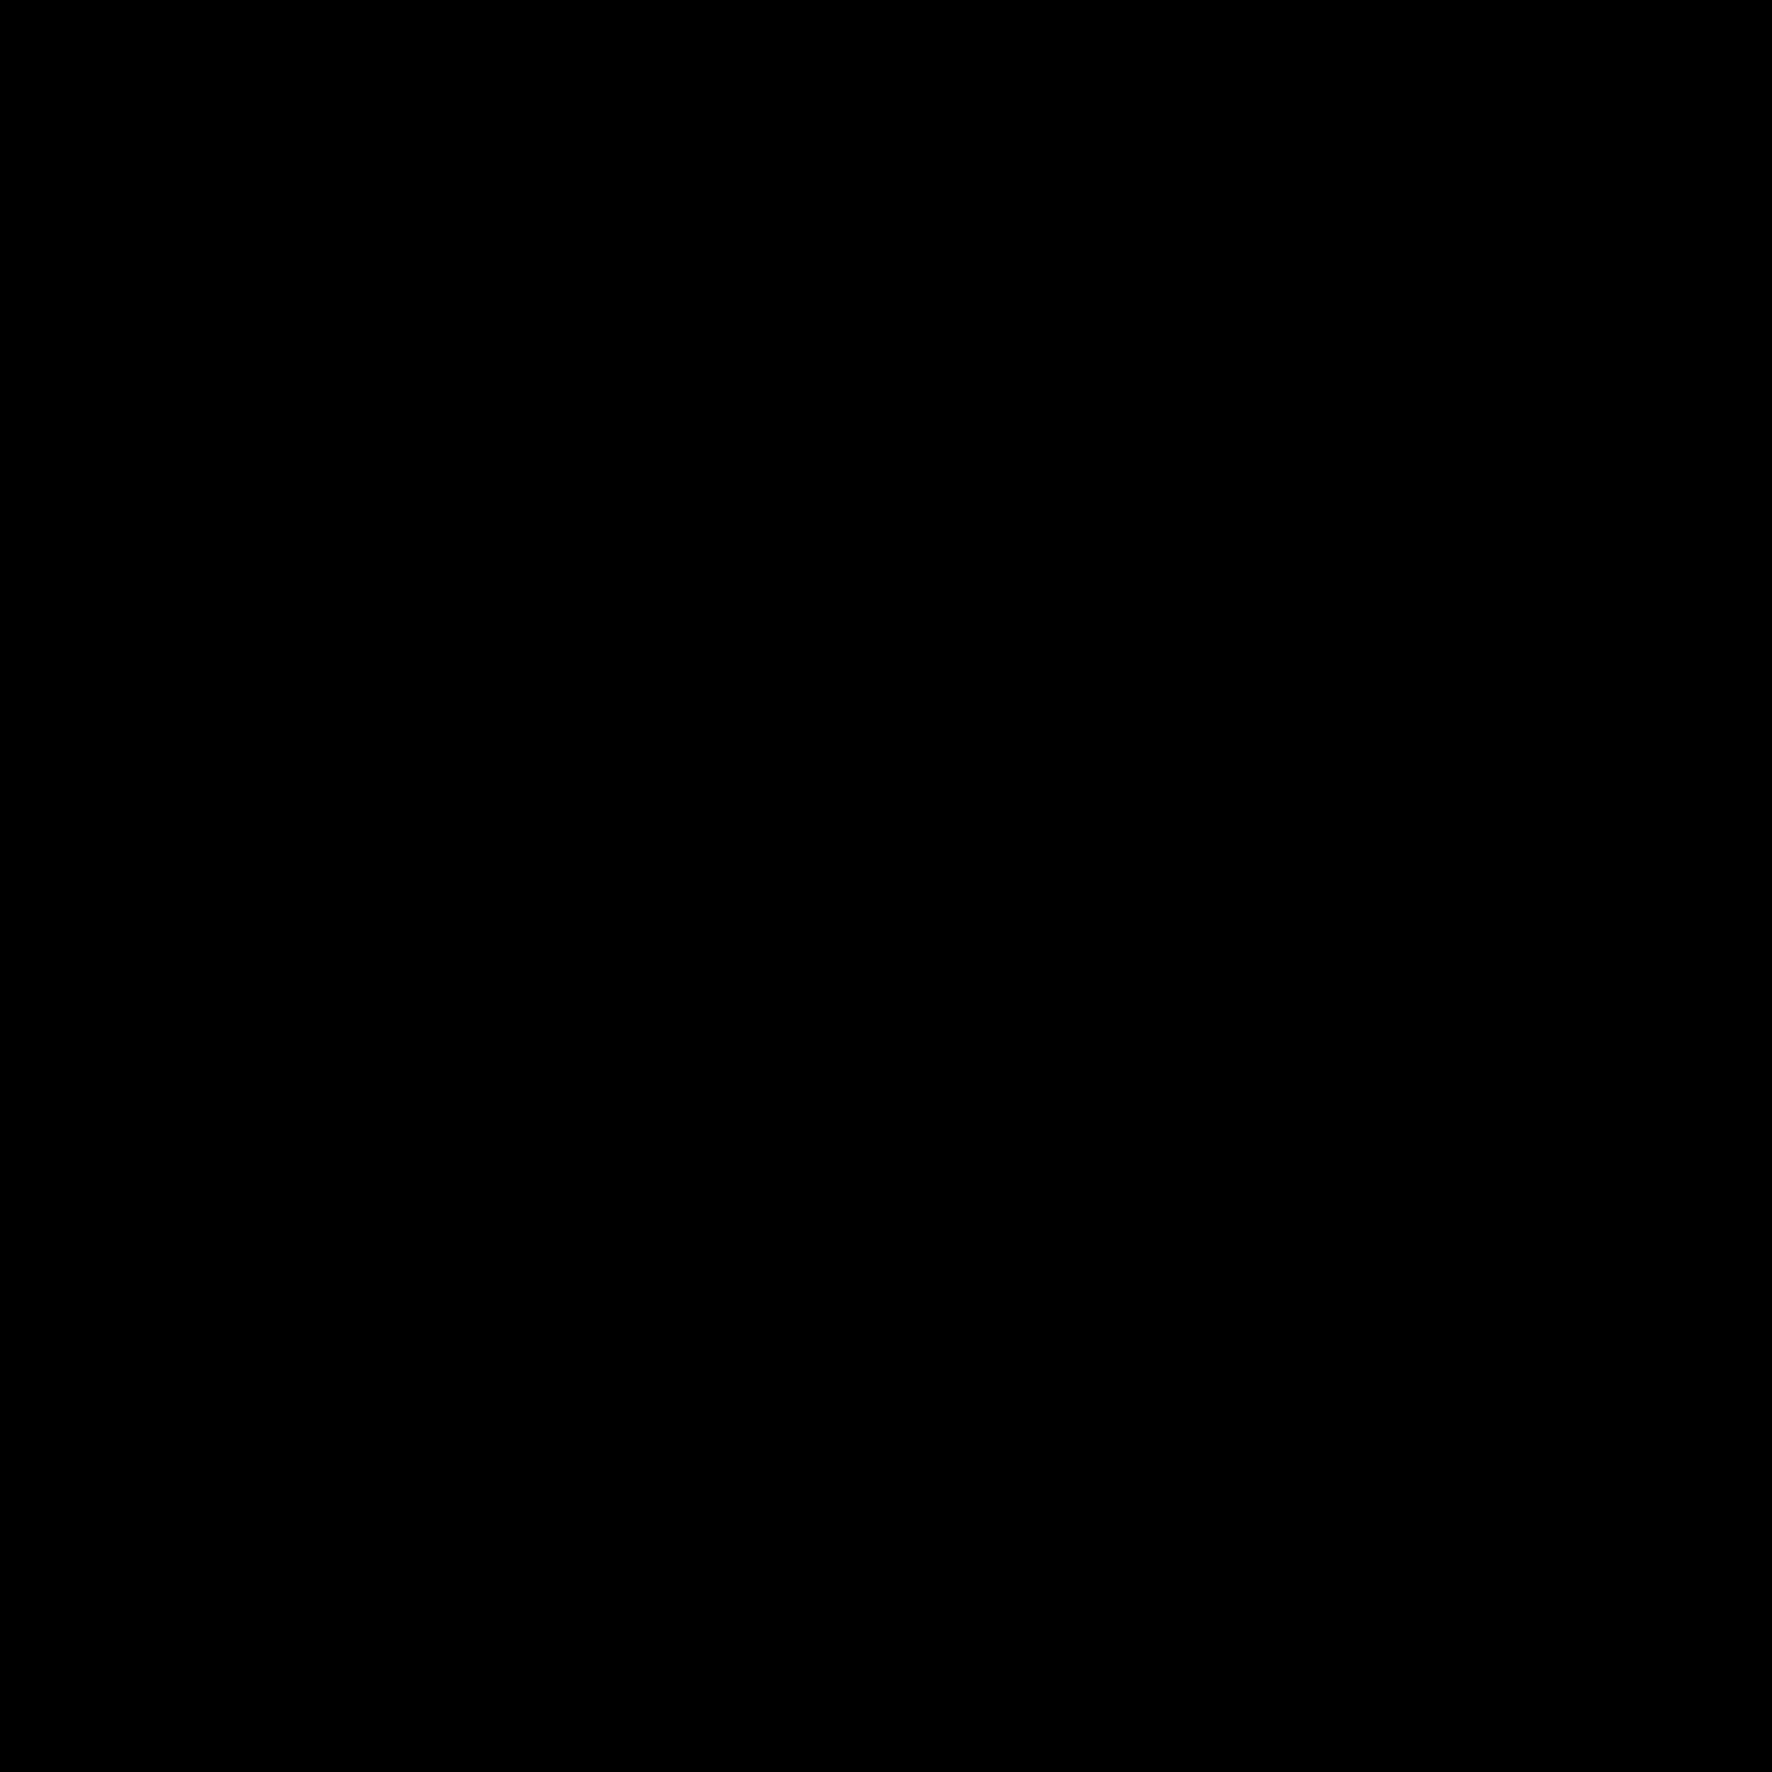 University of Ghana reappoints Professor Ebenezer Oduro Owusu as Vice-Chancellor 1